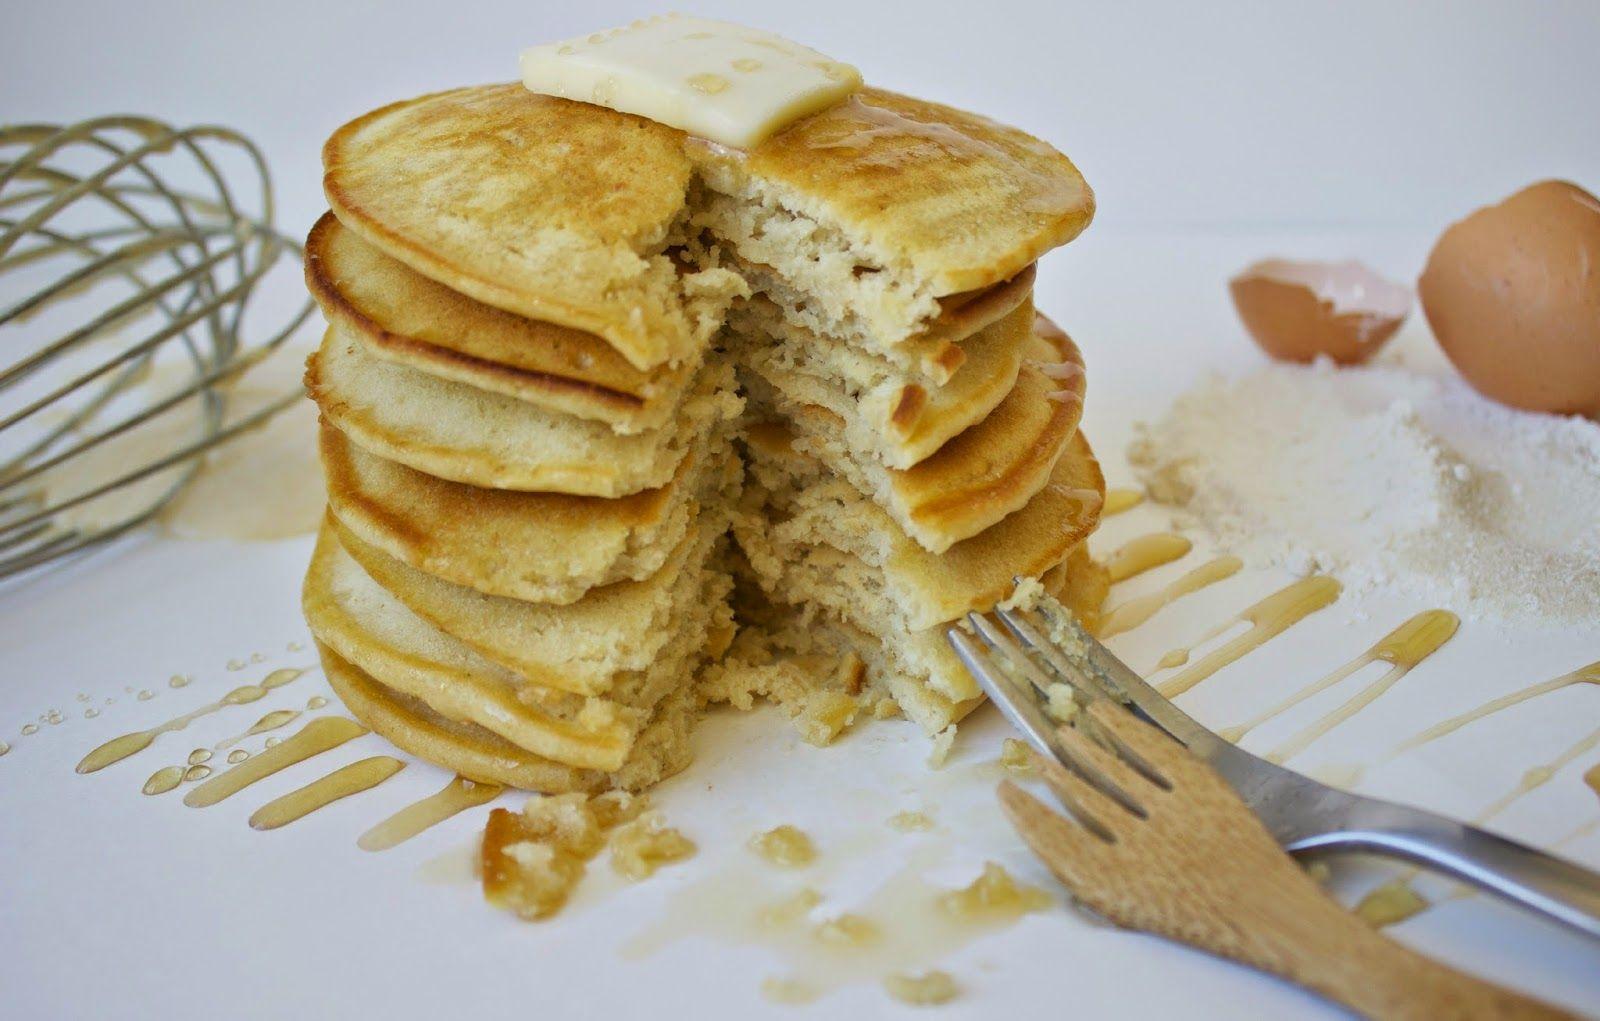 Baby Boy Bakery .: Jacqui & Ryan's Go-To Pancakes Breakfast dishes, Breakfast bites, Eat breakfast